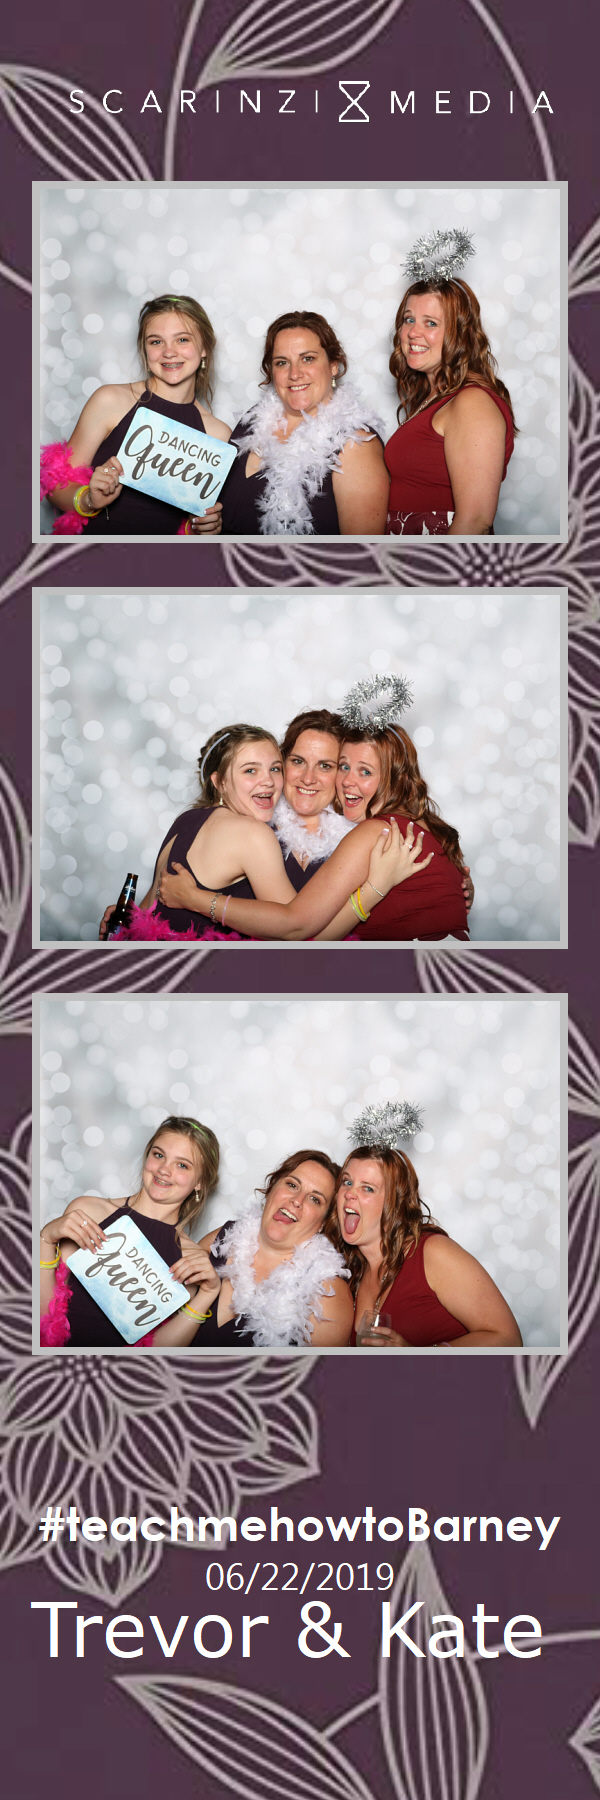 2019.06.22 - Barney Wedding PHOTOBOOTH59.jpg